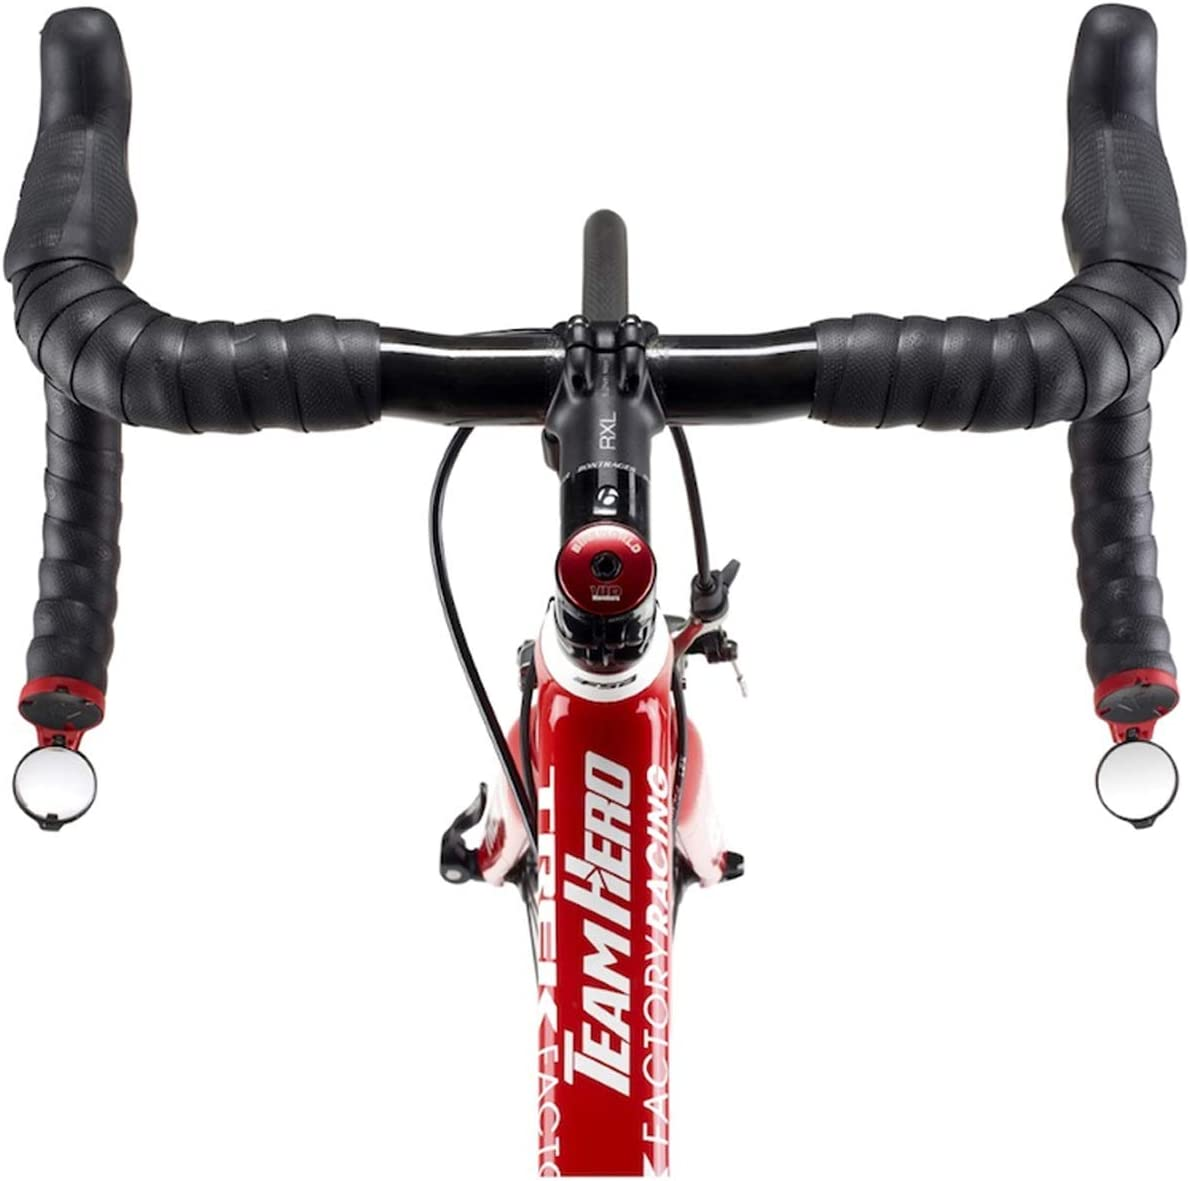 Drop Bar Bike Mirrors Rearview Mirror 360º Rotation For Handlebar End Foldable